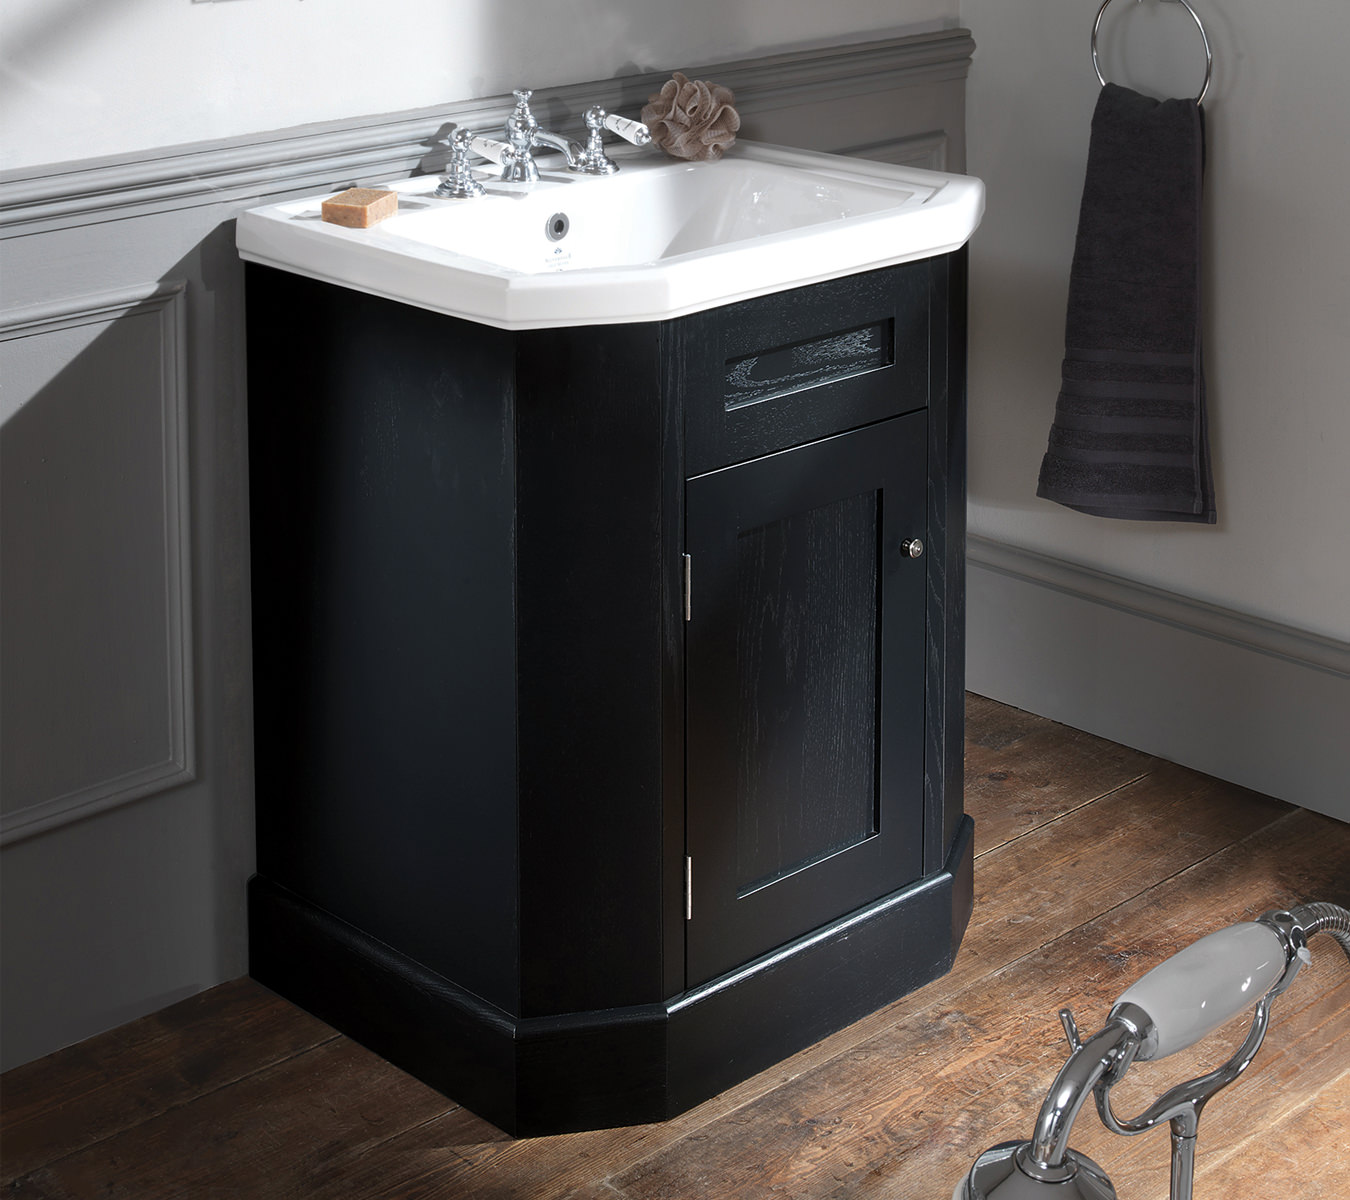 Silverdale Empire 700mm Ebony Black Single Door Vanity Cabinet Em700cabblk